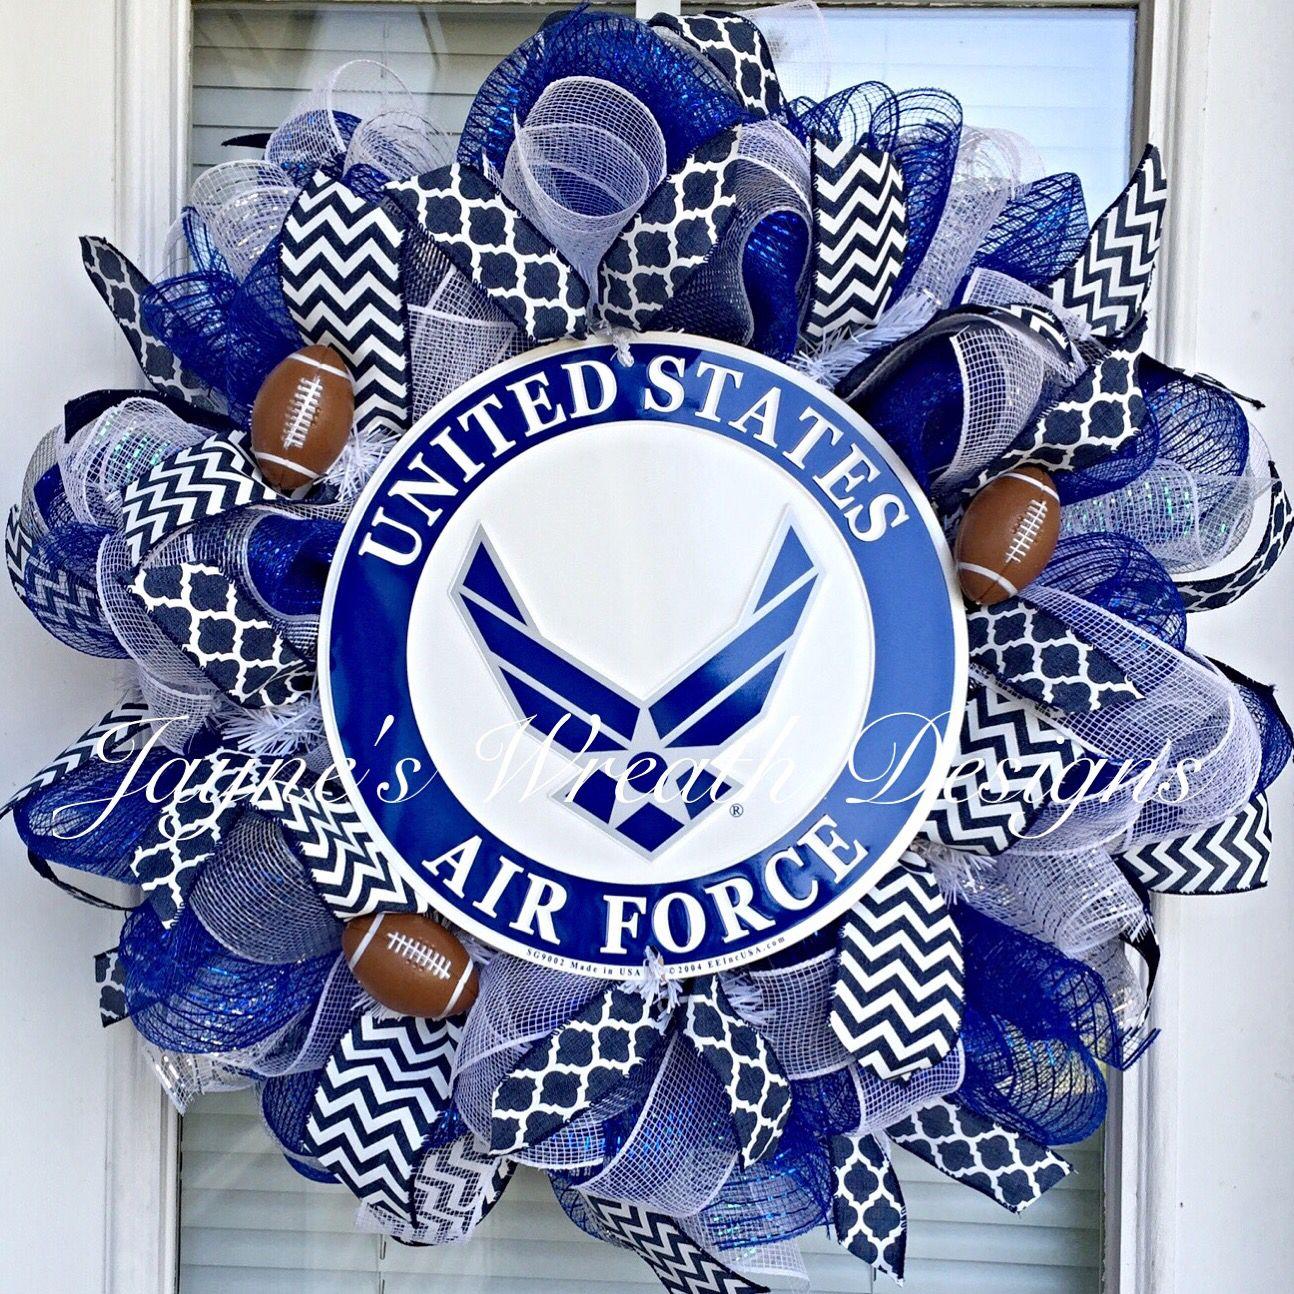 United States Air Force Academy Football Wreath USAF Jayne